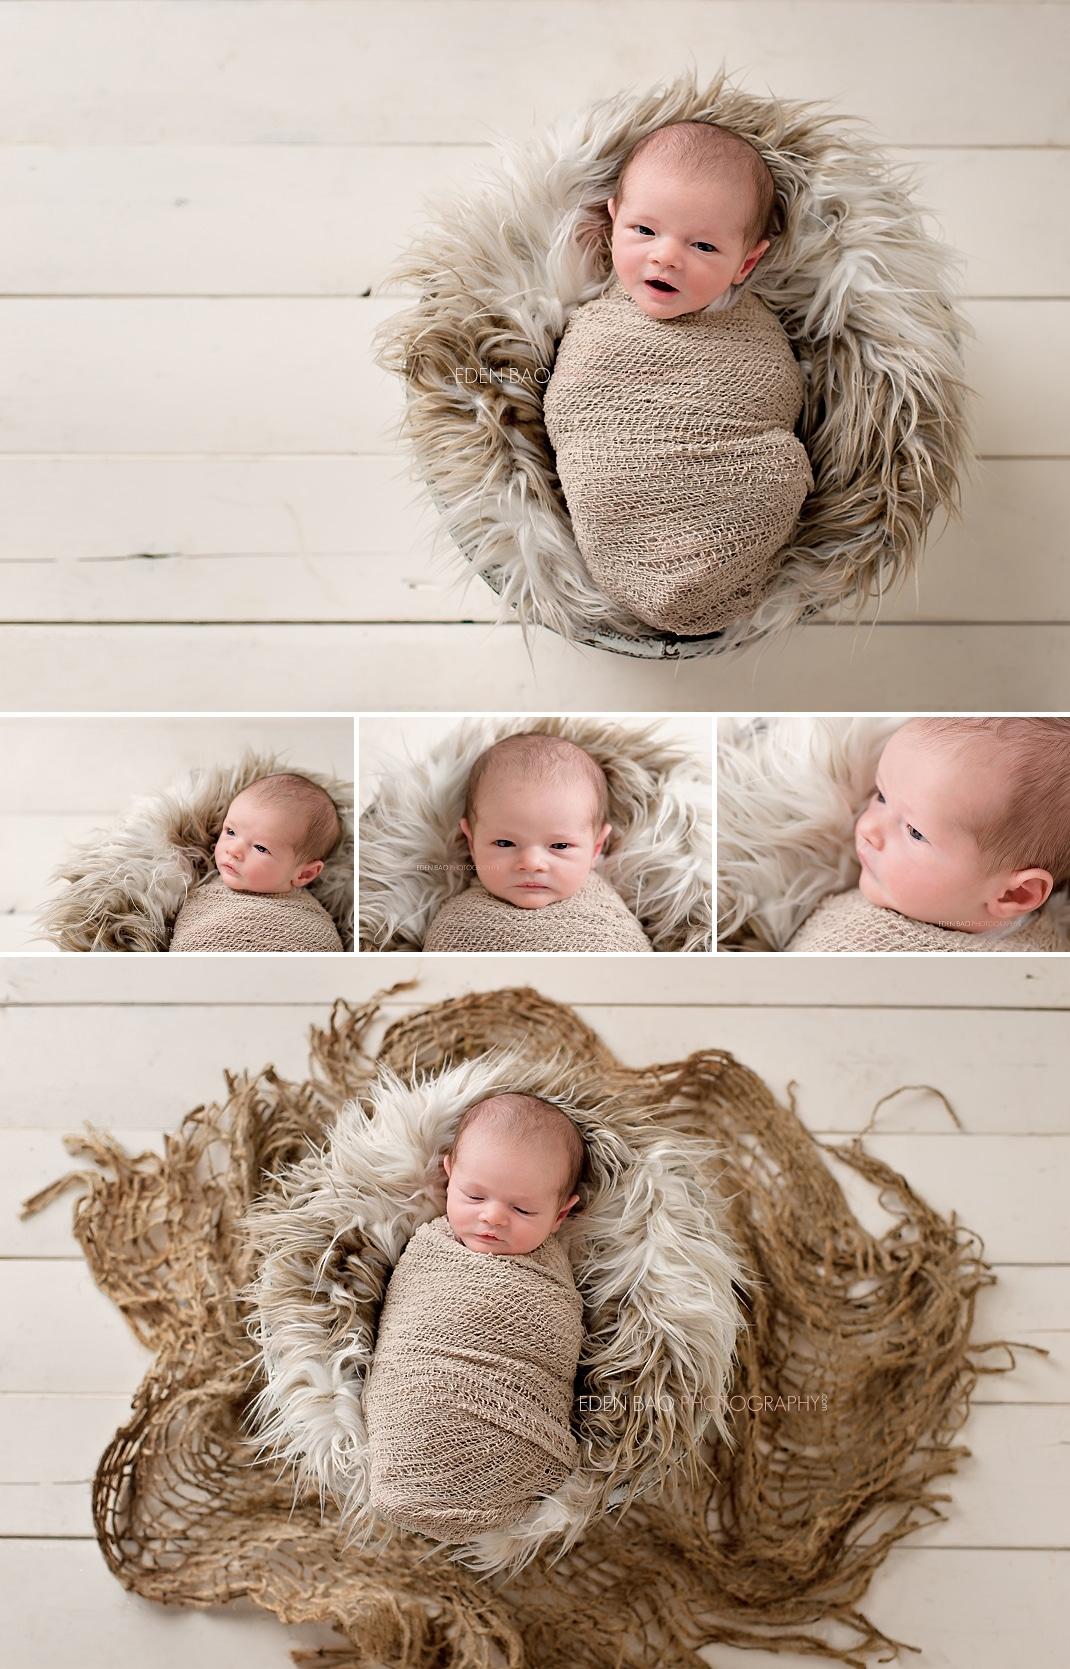 Maternity Newborn Mentoring Shooting Efficiently Part 2